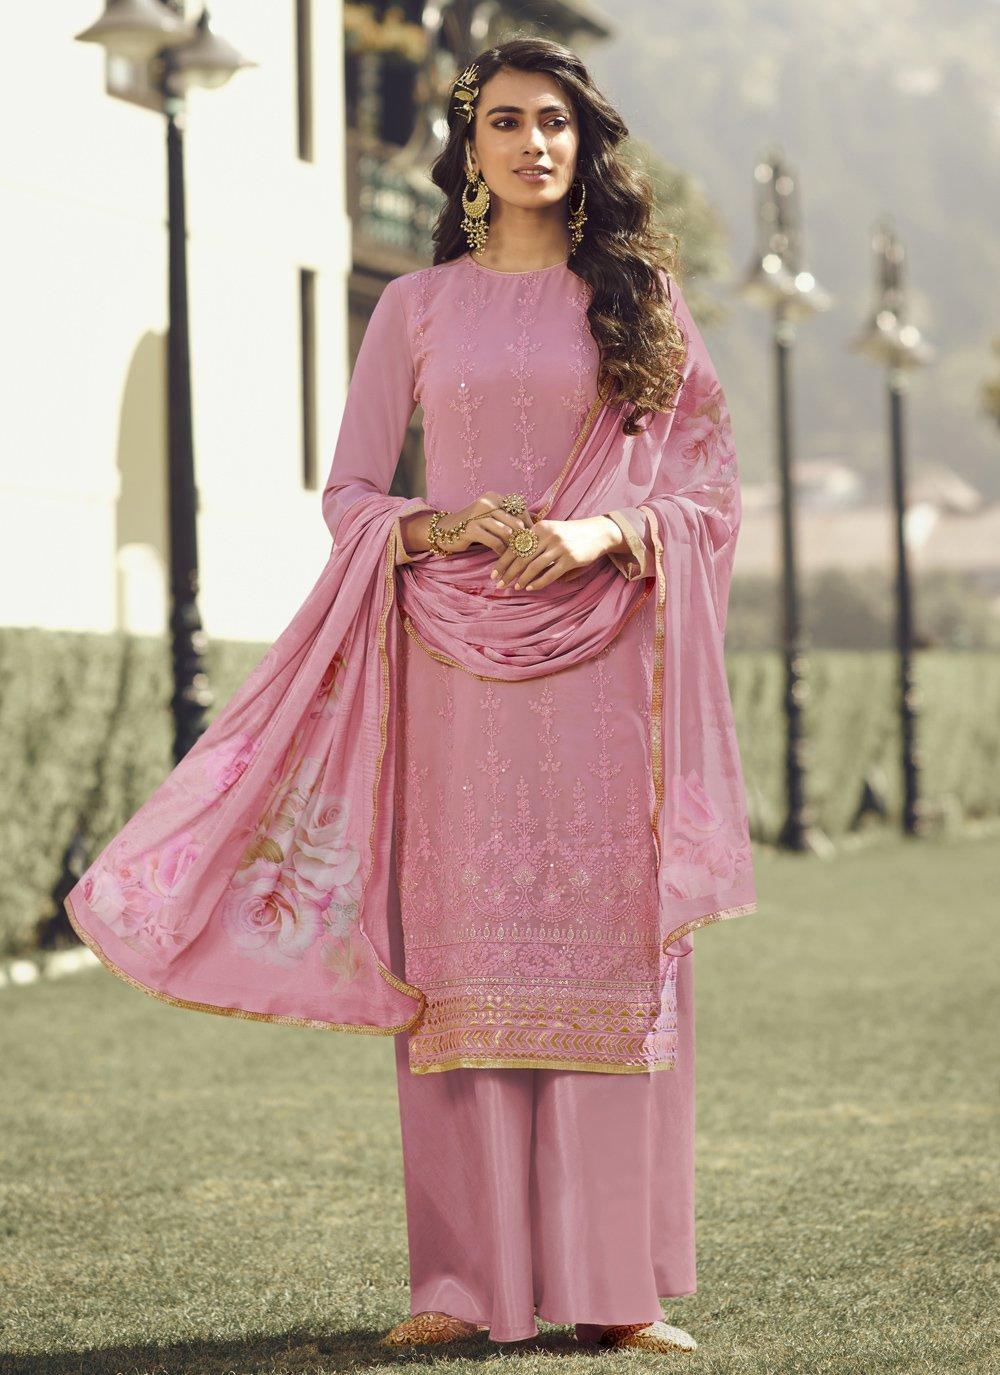 Faux Georgette Embroidered Designer Palazzo Salwar Kameez in Pink